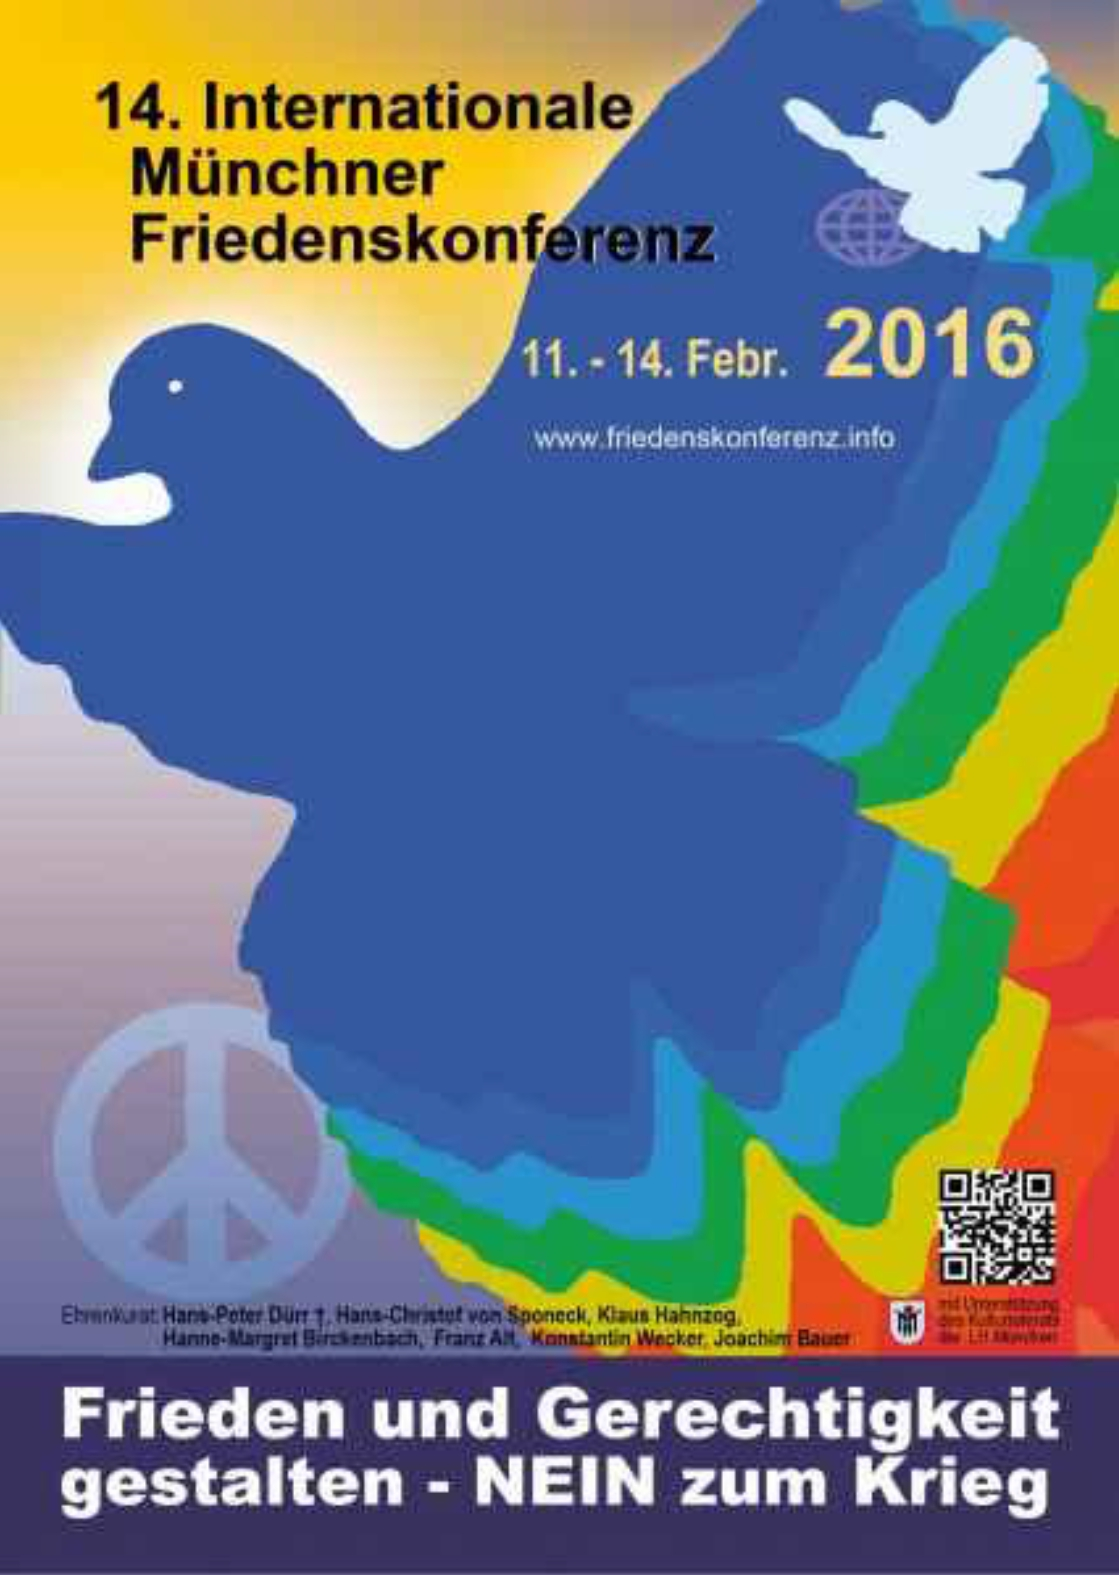 Plakat Friedenskonferenz 2016